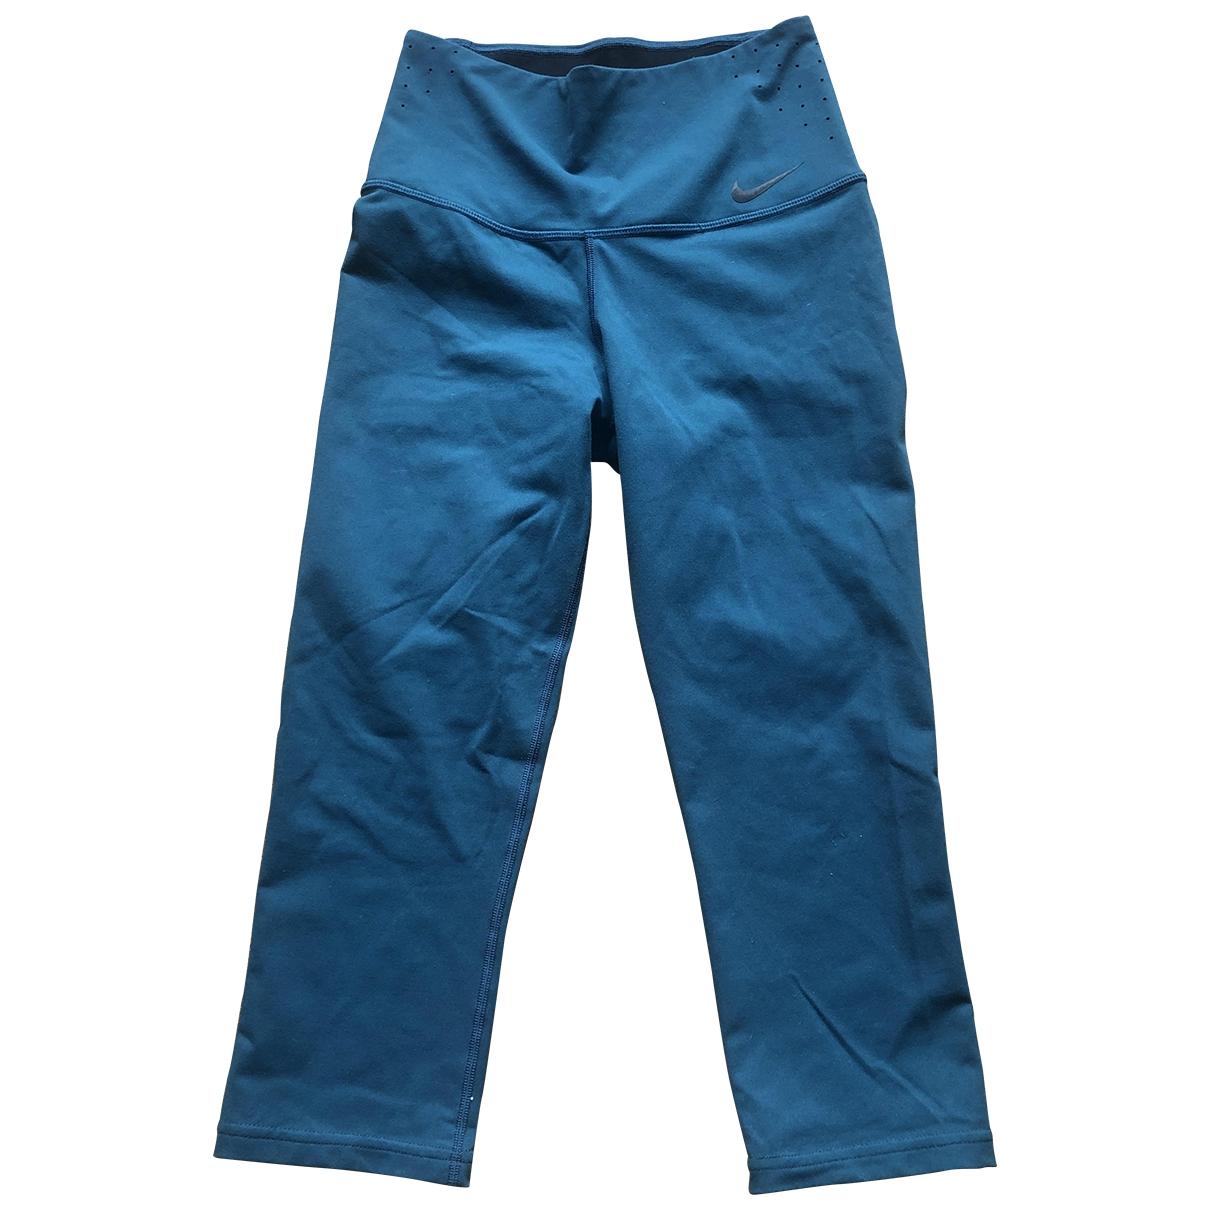 Nike \N Blue Trousers for Women M International